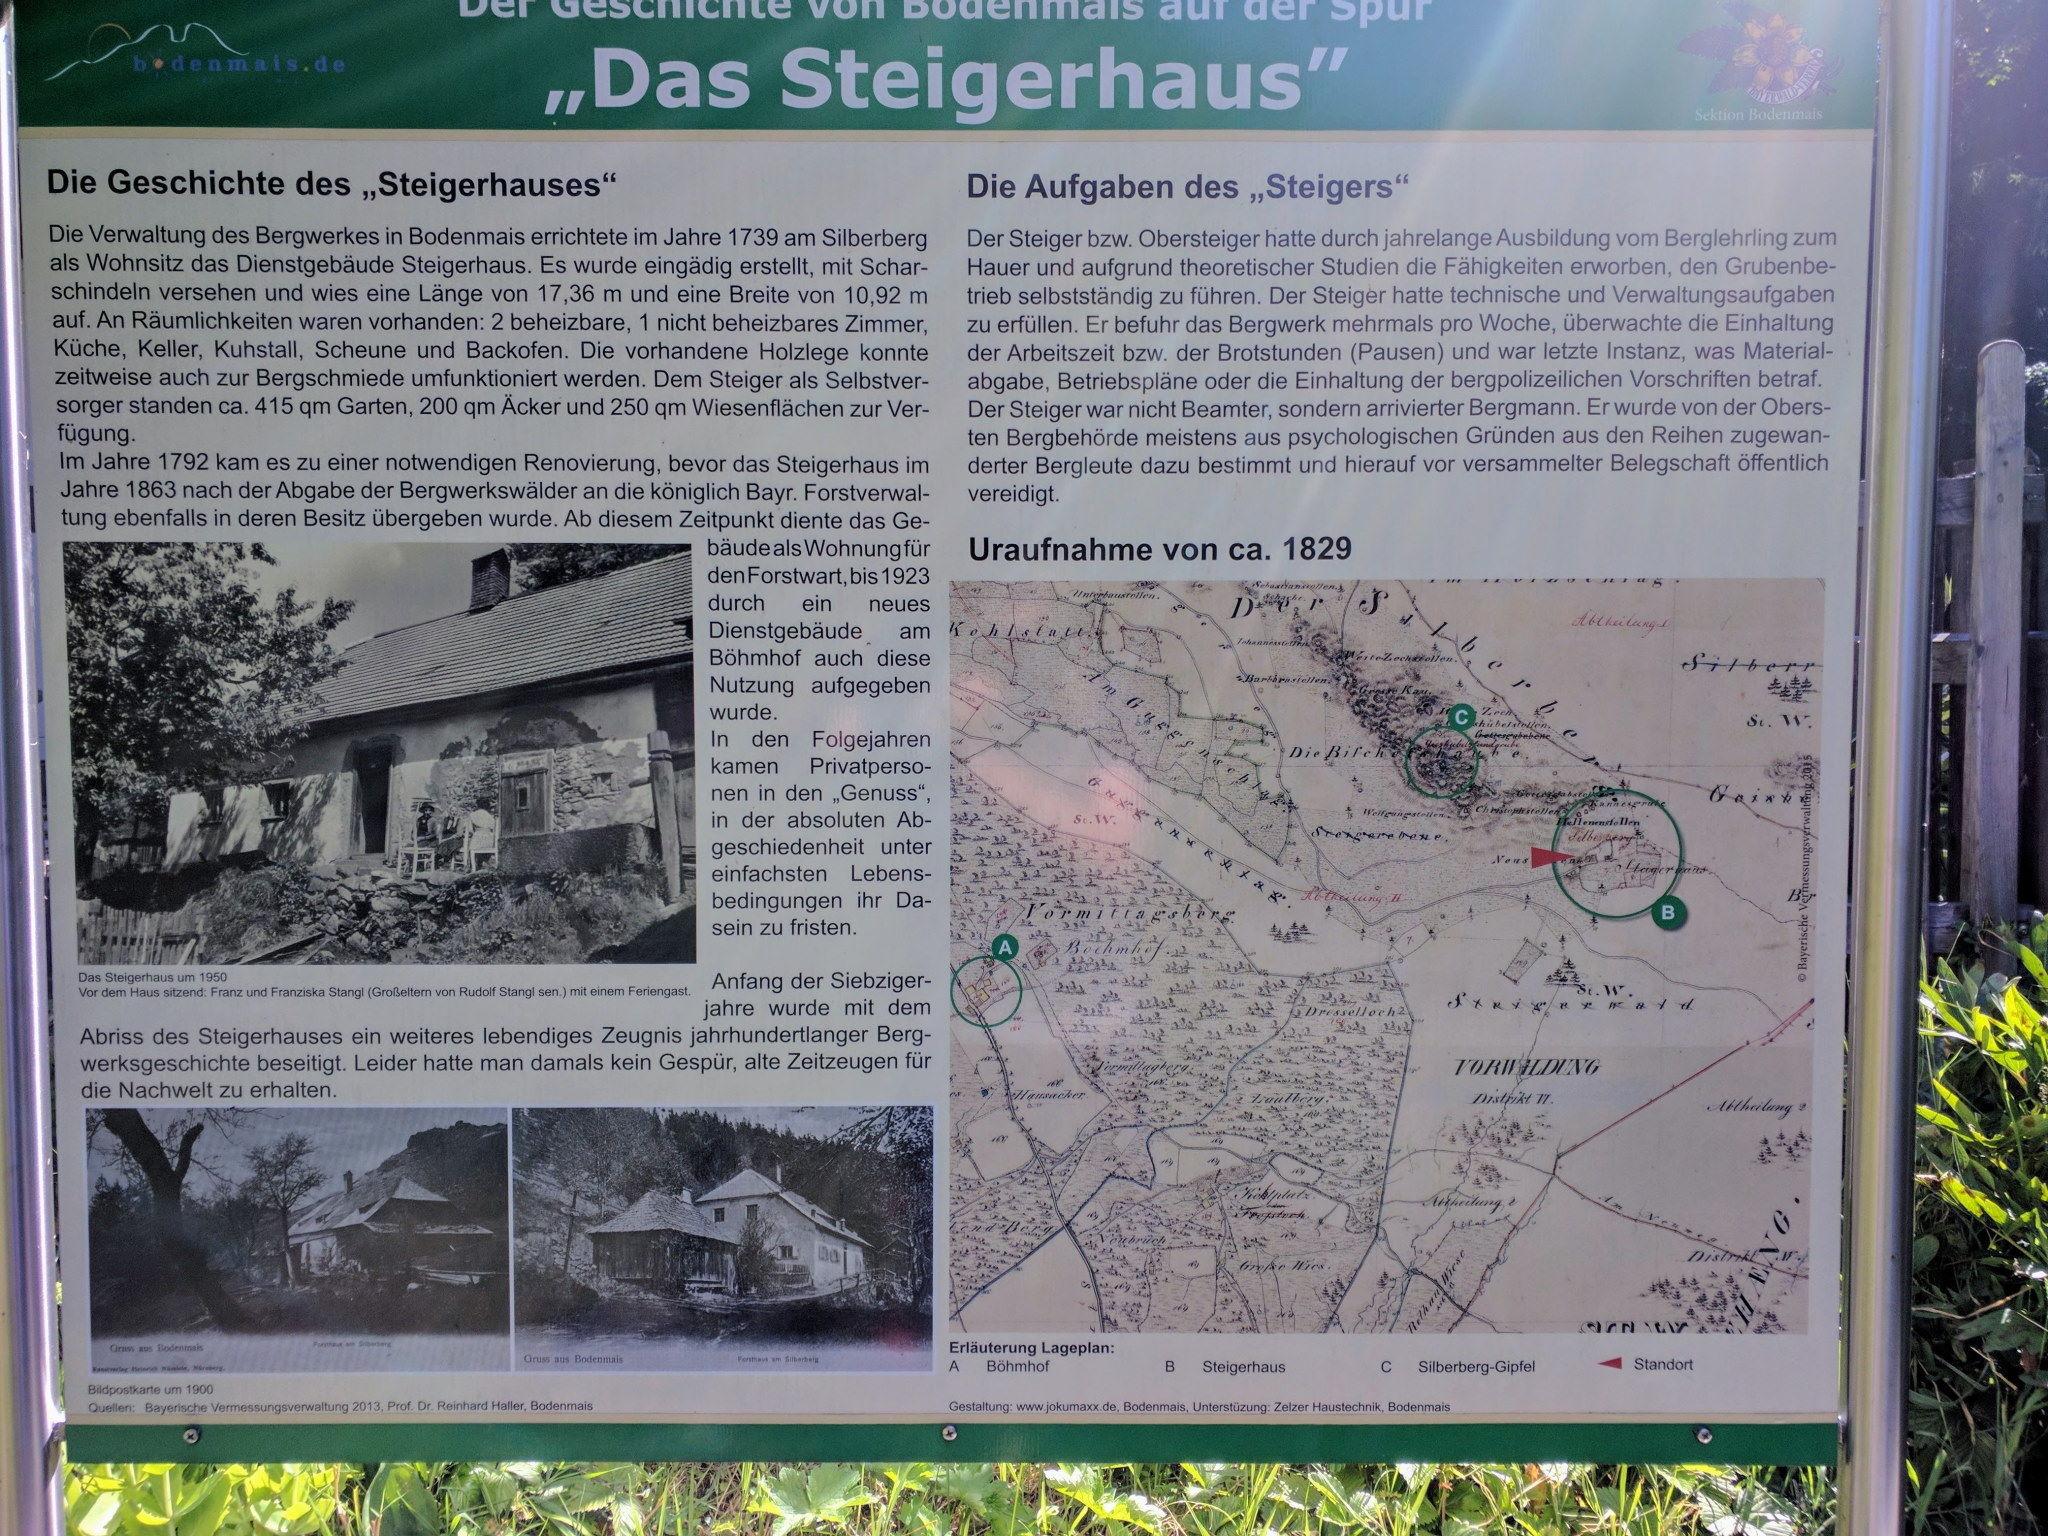 Tafel Steigerhaus